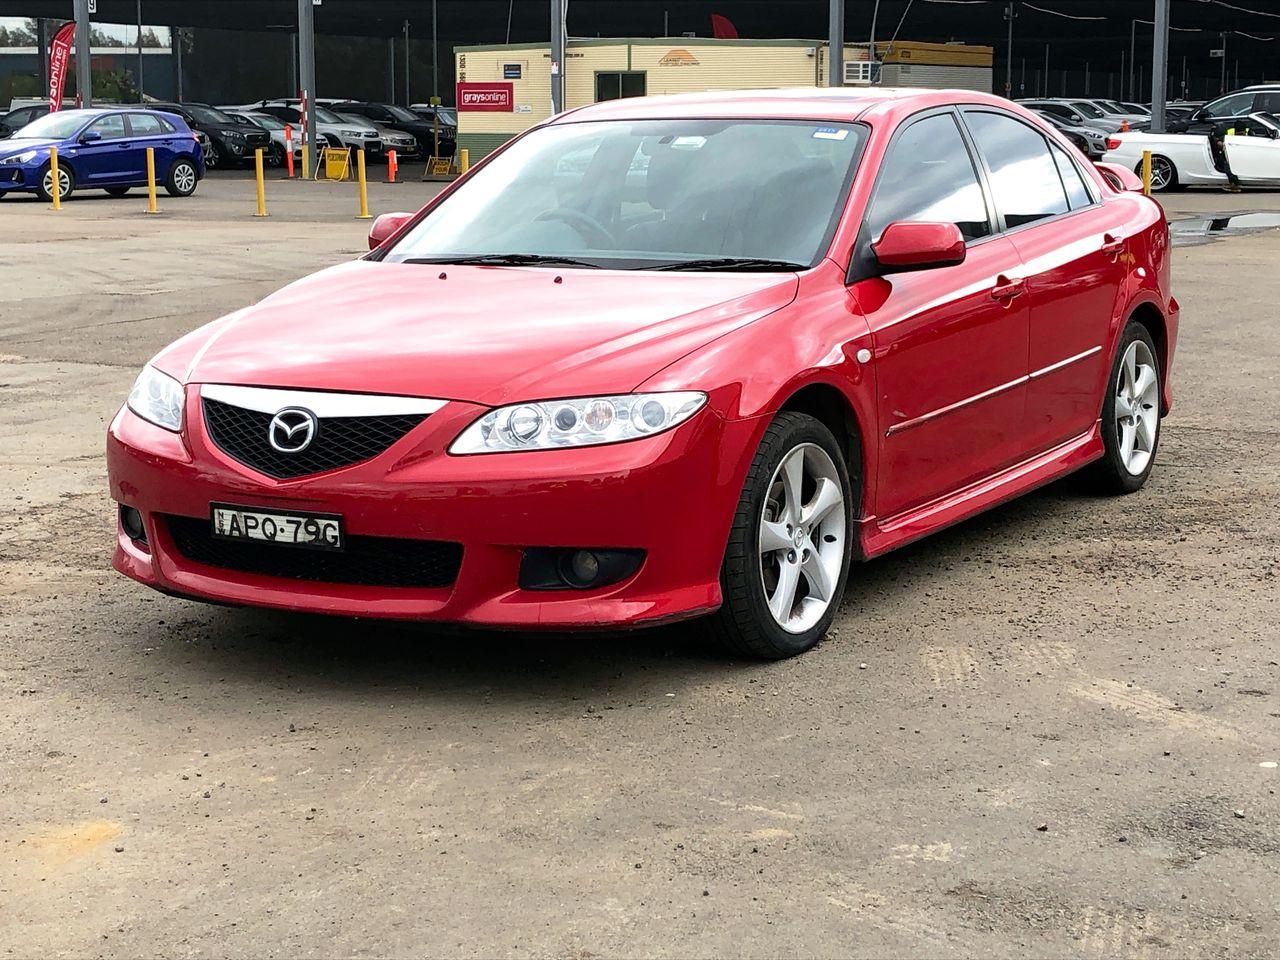 2003 Mazda 6 Luxury Sports GG Manual Sedan